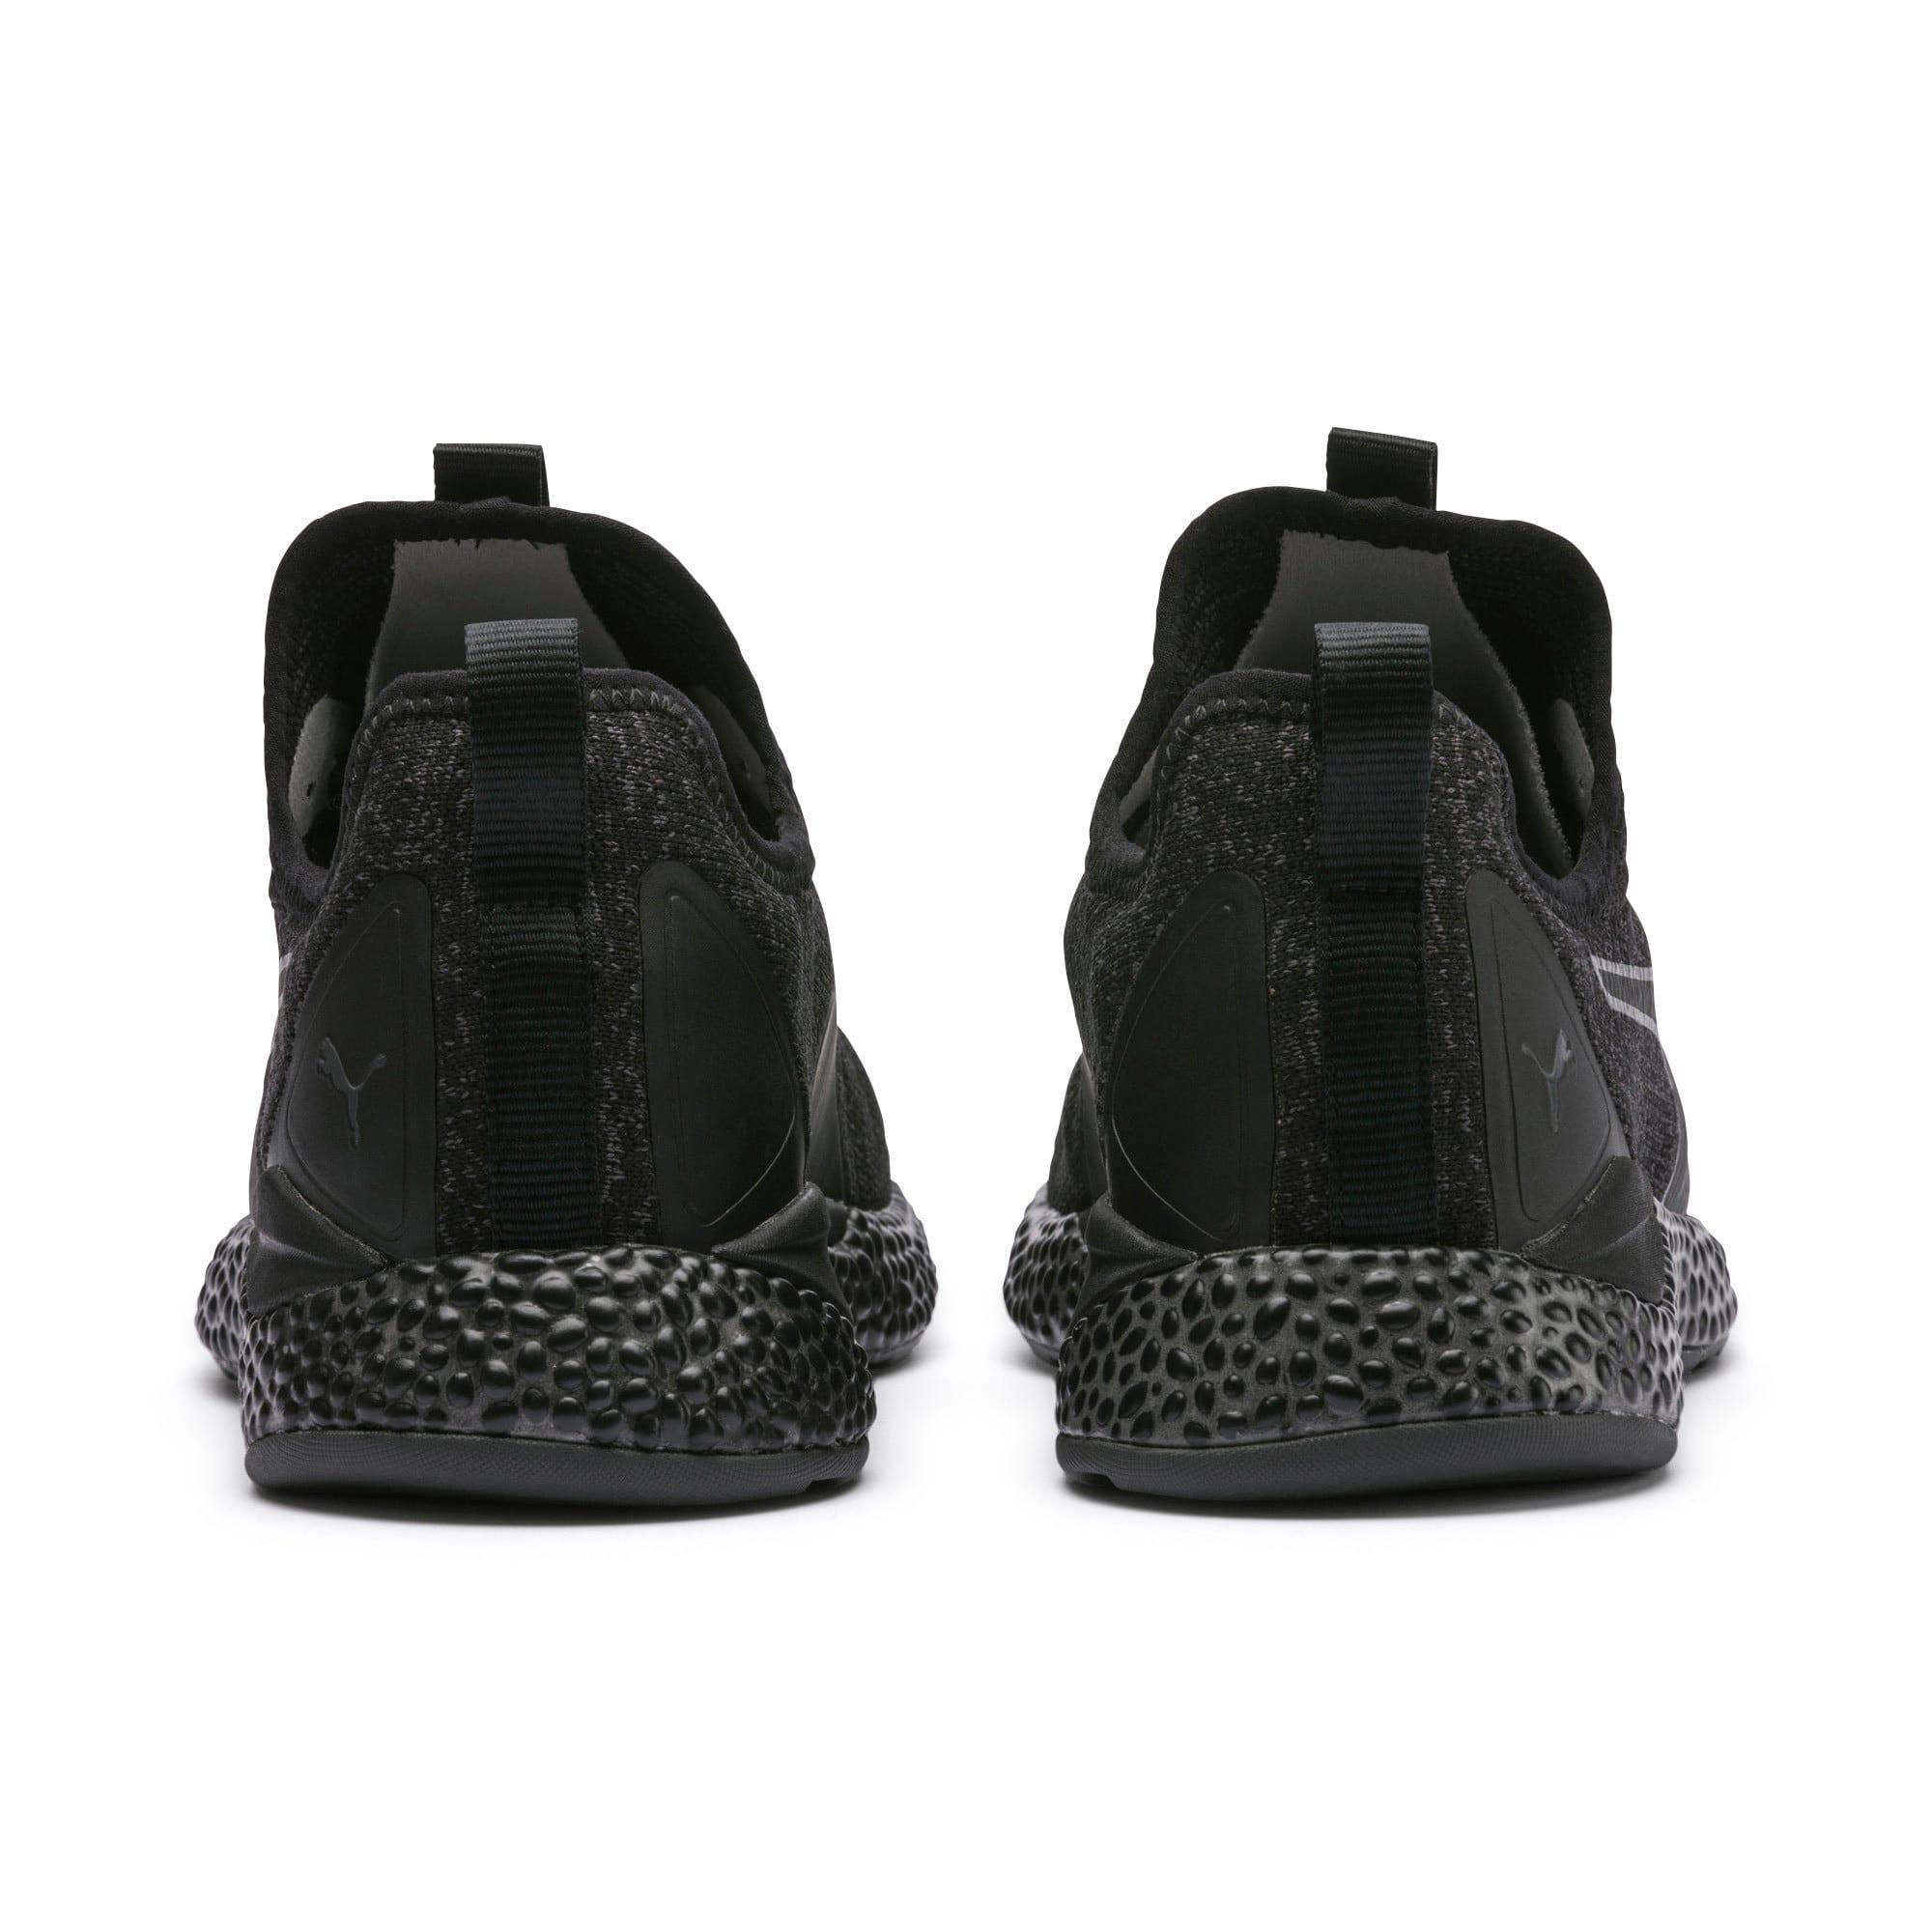 Thumbnail 4 of Hybrid Runner Men's Running Shoes, Asphalt-Puma Black, medium